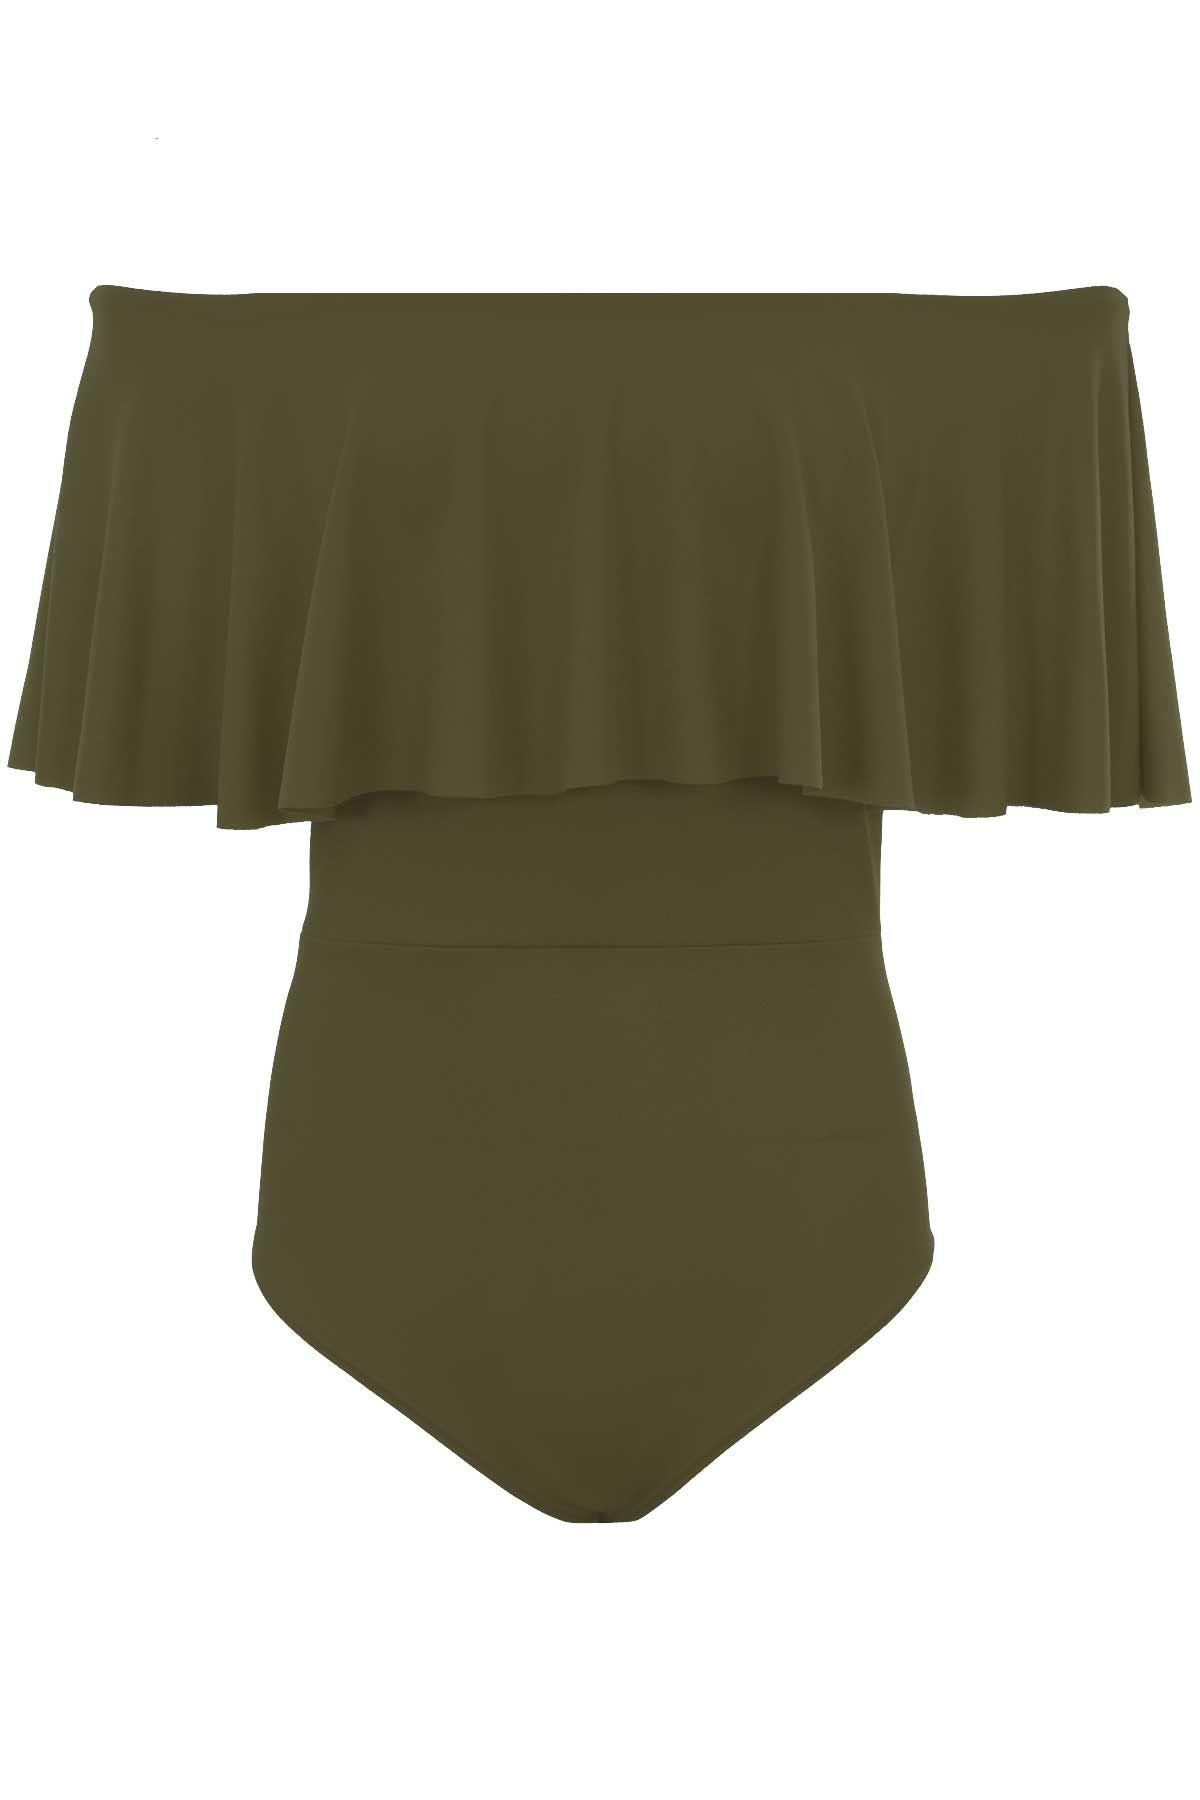 Ladies Bodycon Bardot Off Shoulder Stretch Frill Crepe Textured Bodysuit Leotard